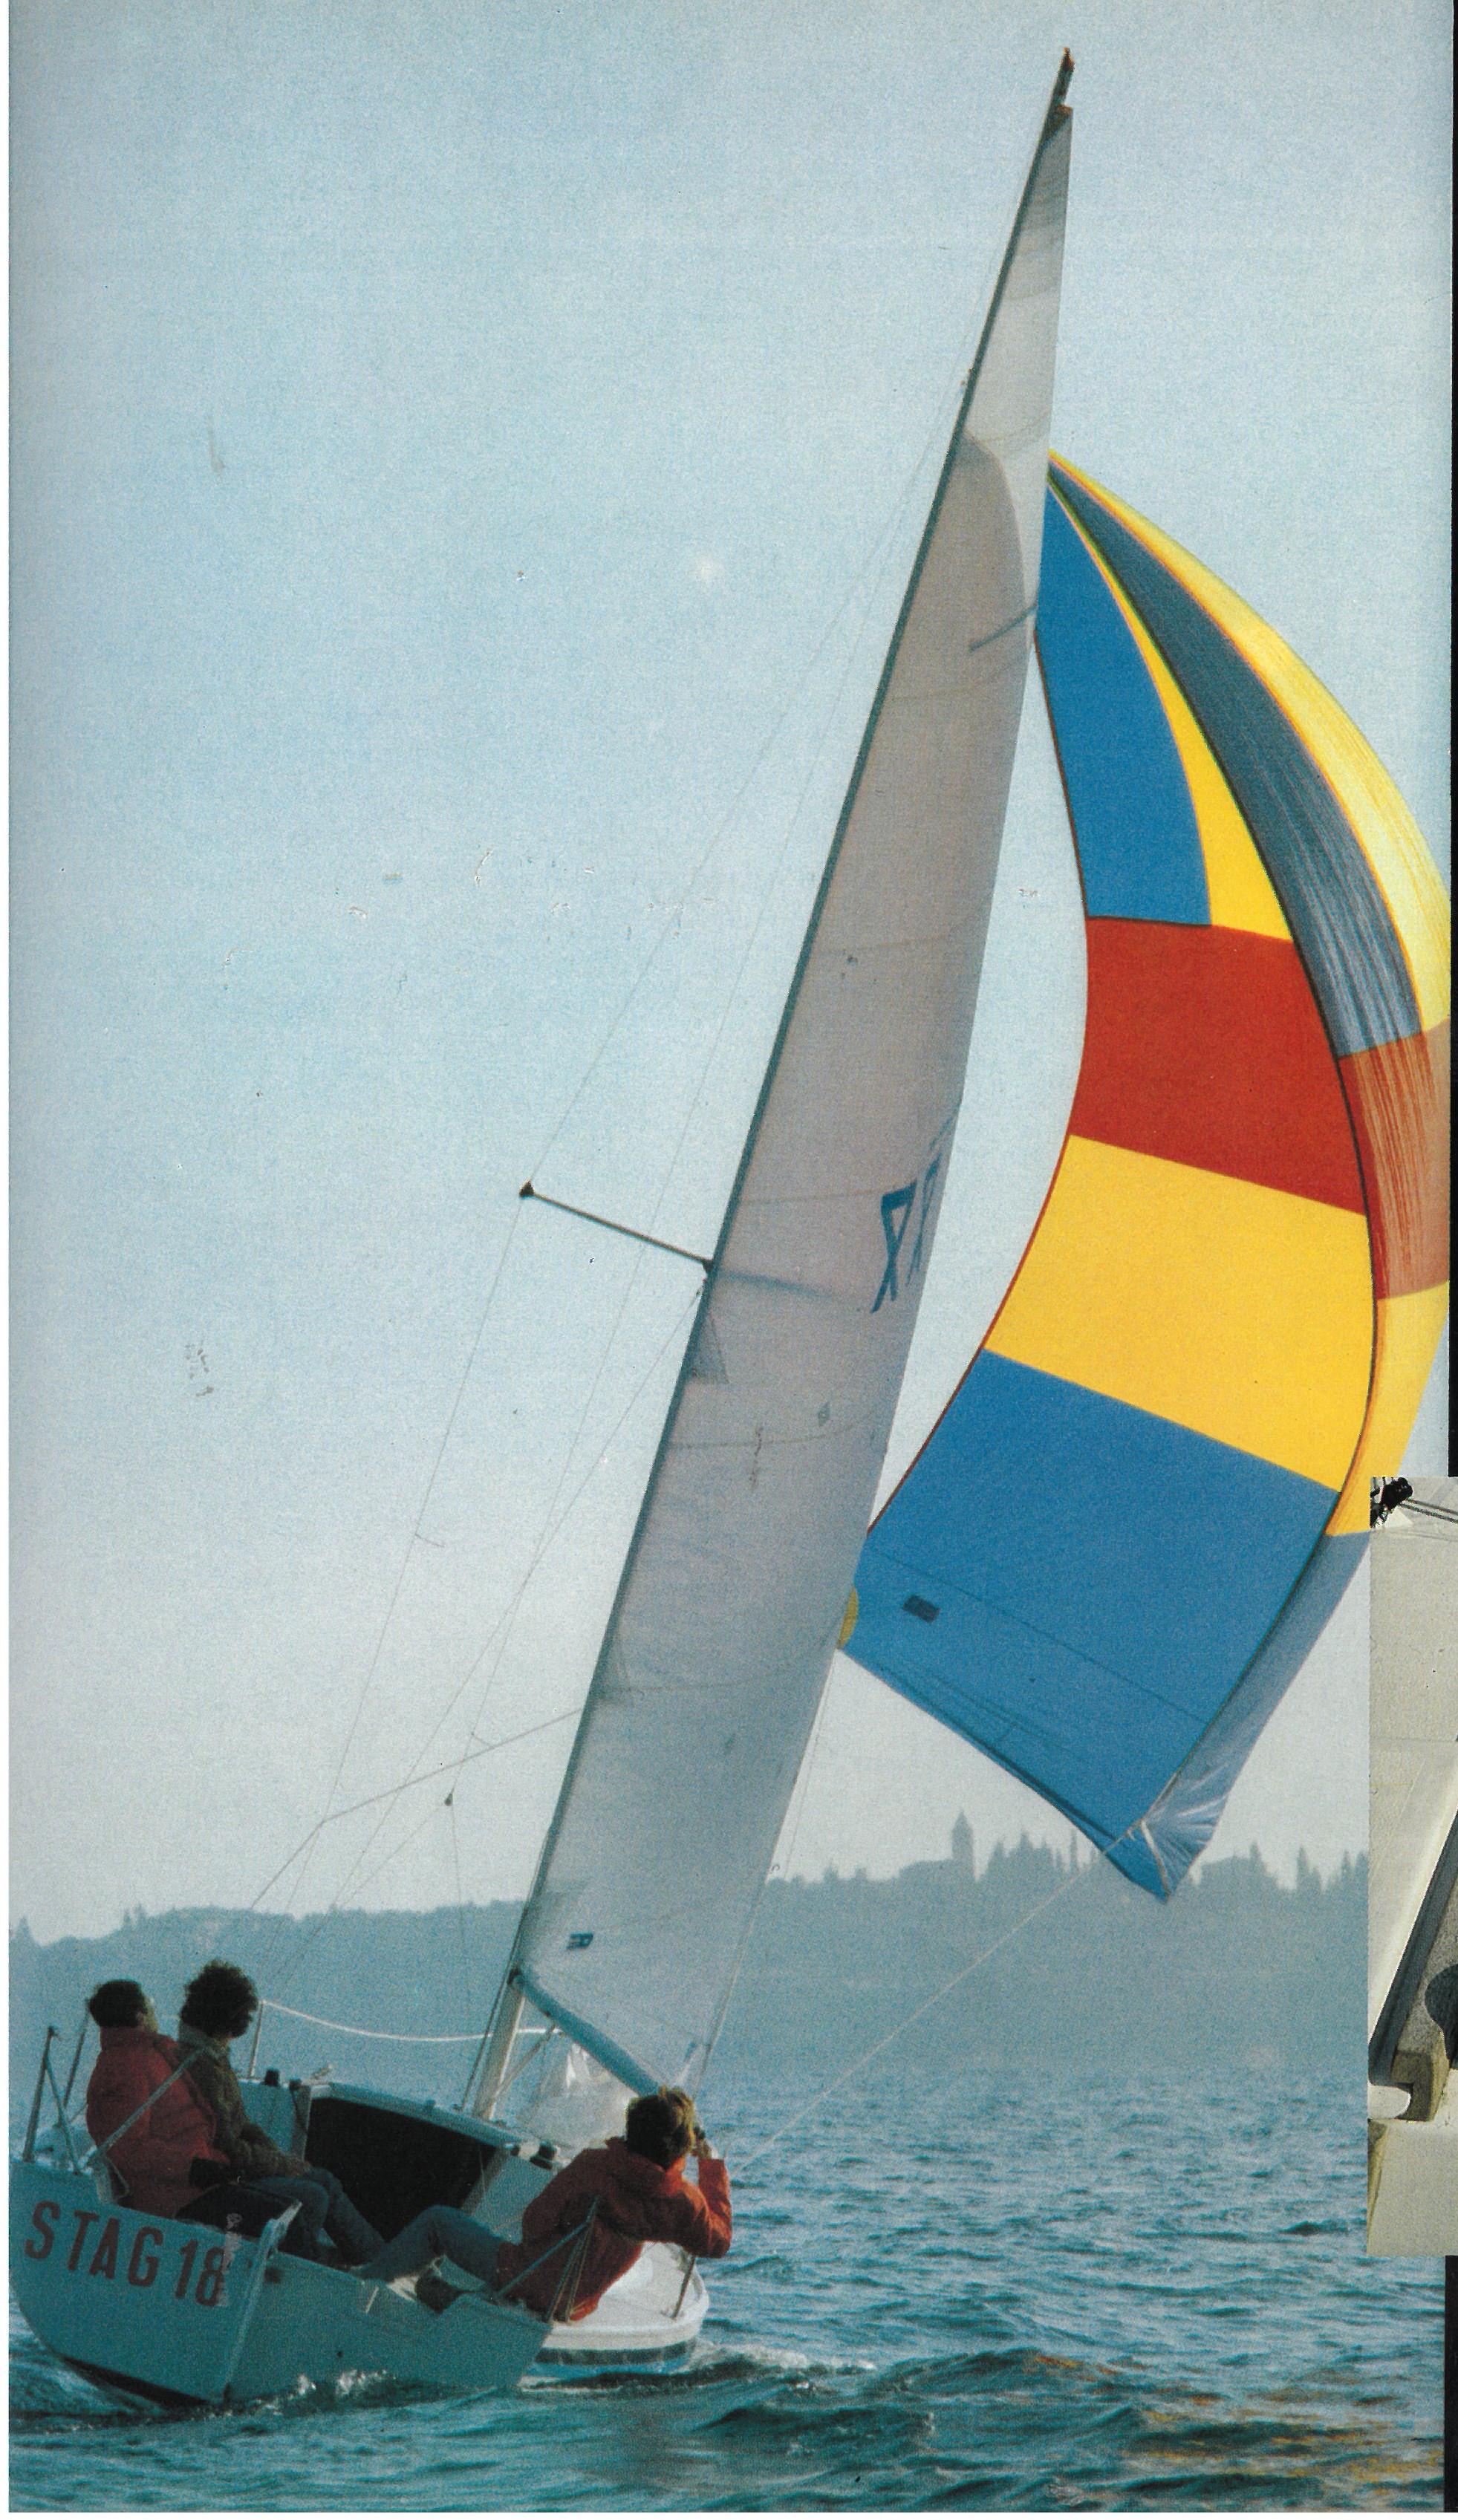 stag 18 prova 1981